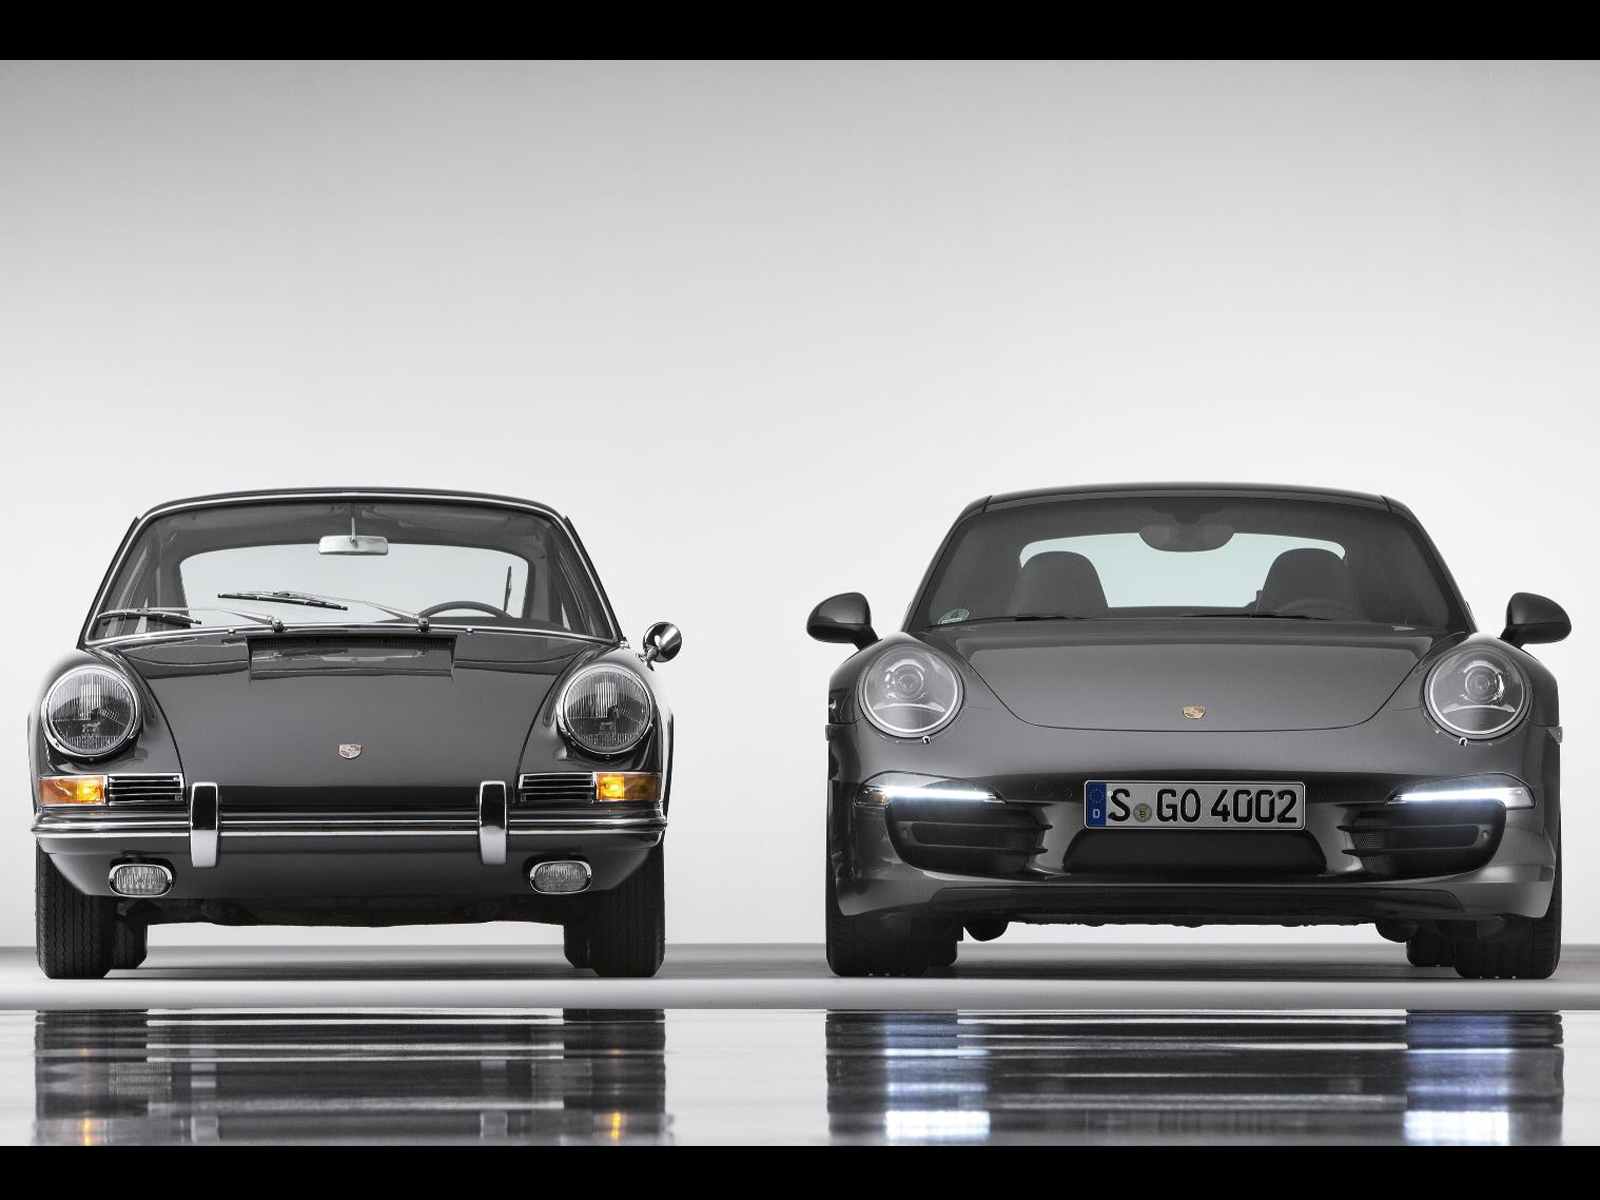 new2Bvs2Bold2 Πόσο πιο γρήγορη είναι μια καινούρια Porsche 911 από μια παλιά; Nurburgring, Porsche, Porsche 911, Porsche 911 Turbo, video, videos, βίντεο